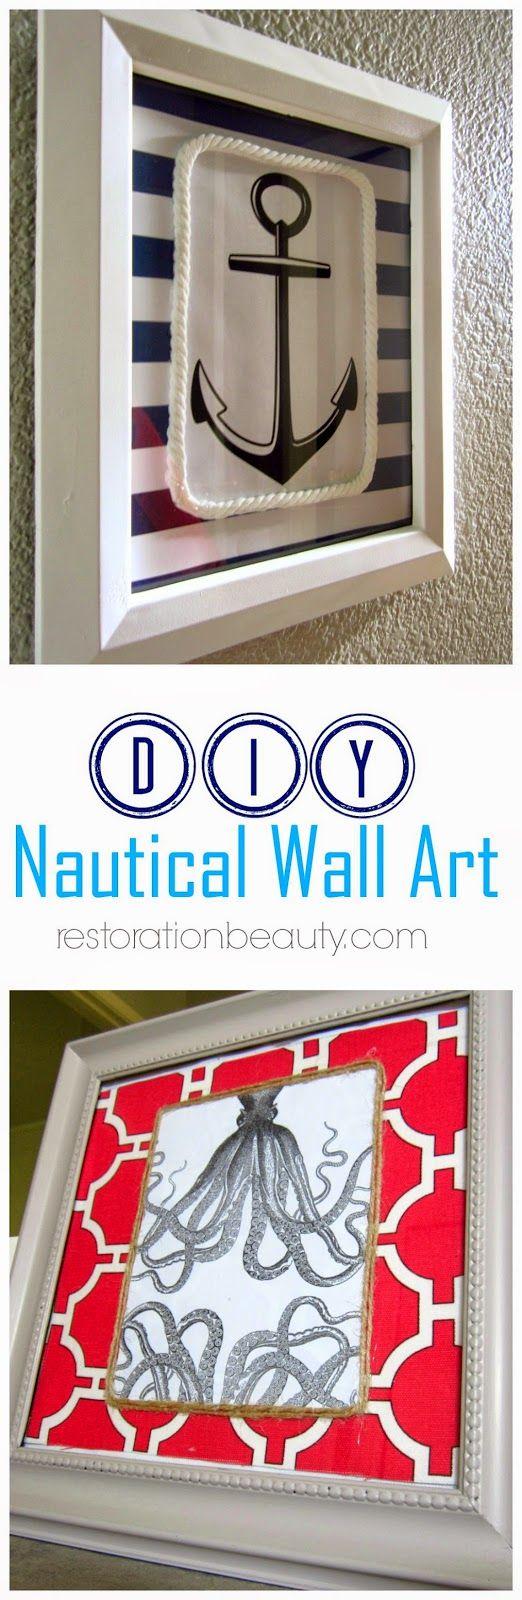 Diy nautical wall art nautical wall art and restoration